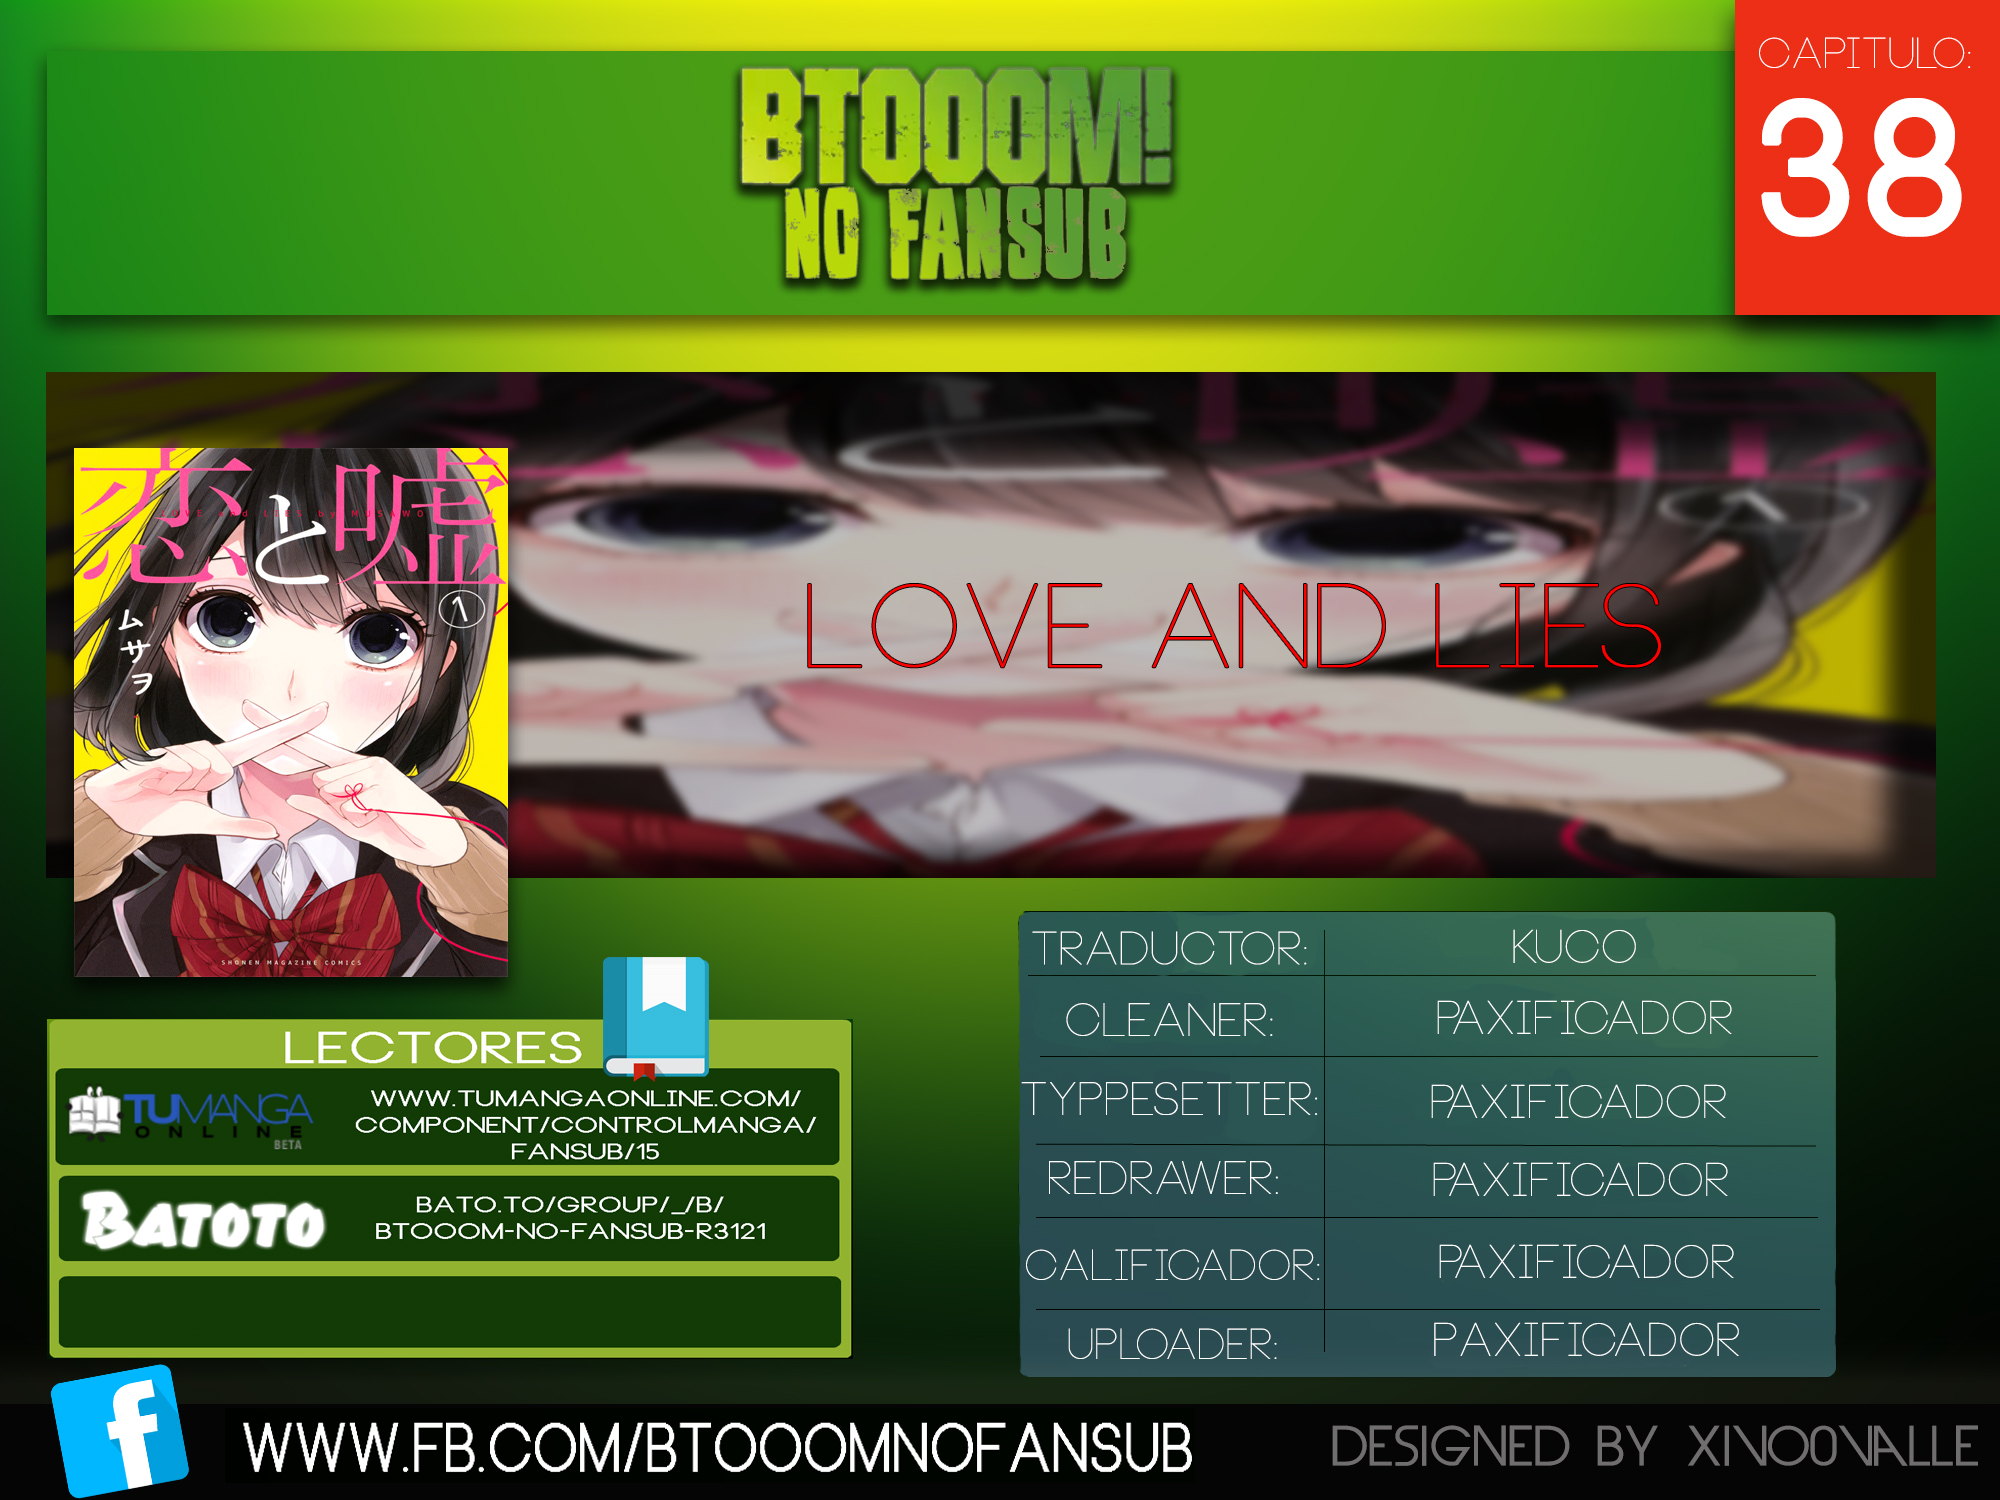 http://c5.ninemanga.com/es_manga/14/14734/383180/0e71410b90eb9a92b6375cd3b18b33ed.jpg Page 1